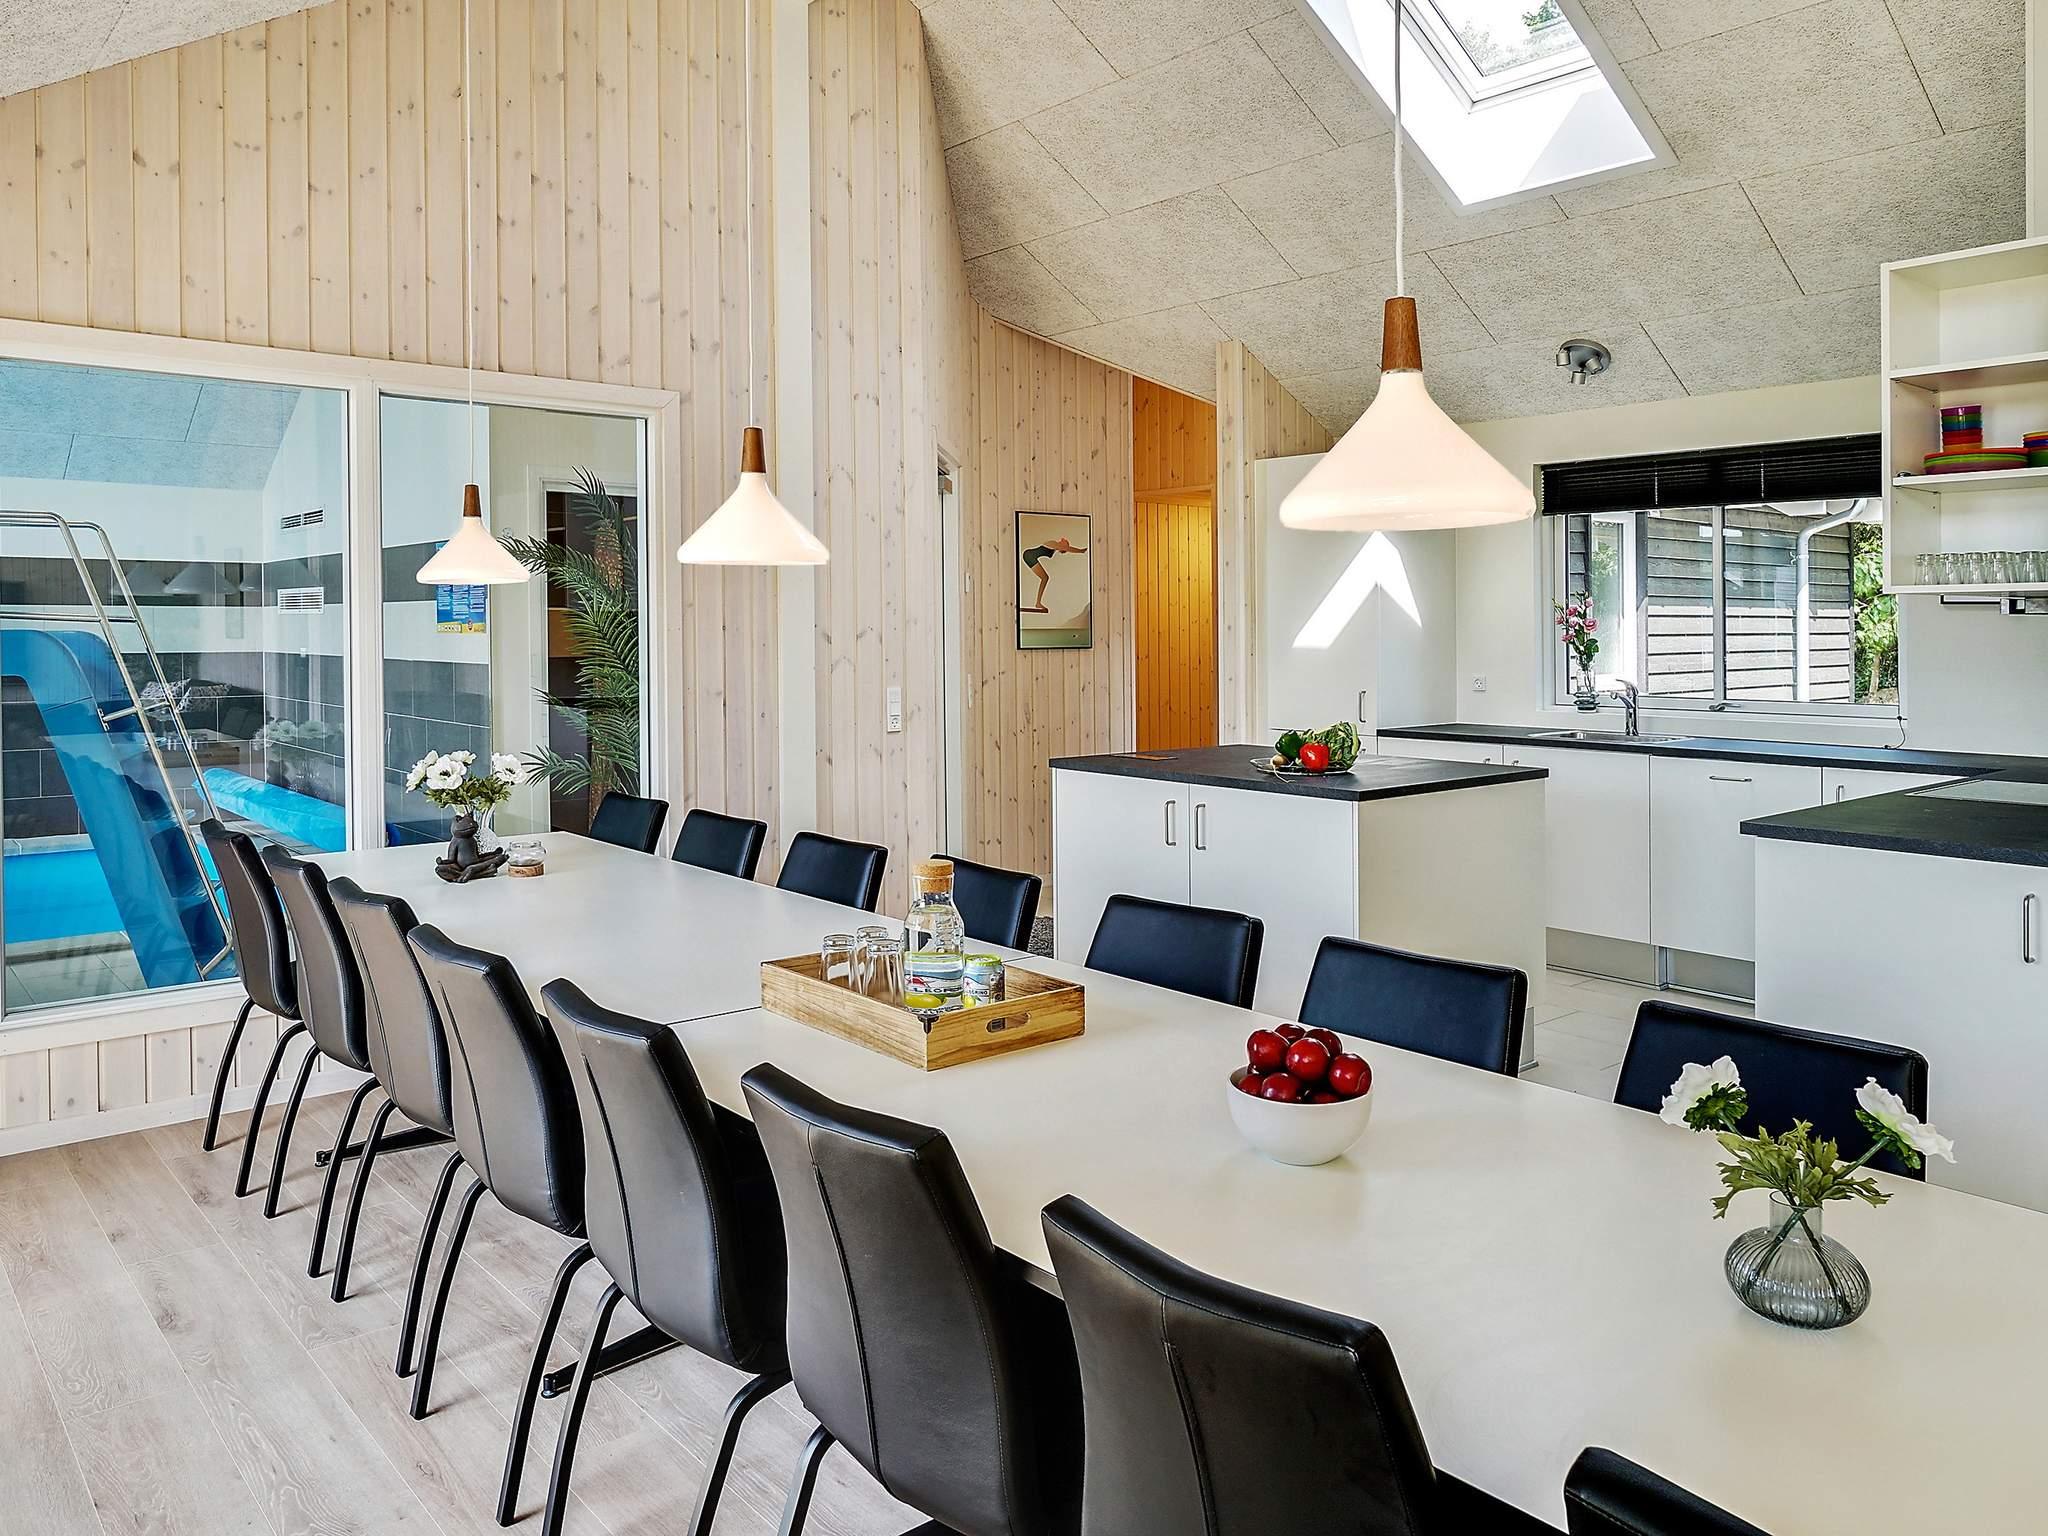 Ferienhaus Vejby Strand (2354752), Vejby, , Nordseeland, Dänemark, Bild 5